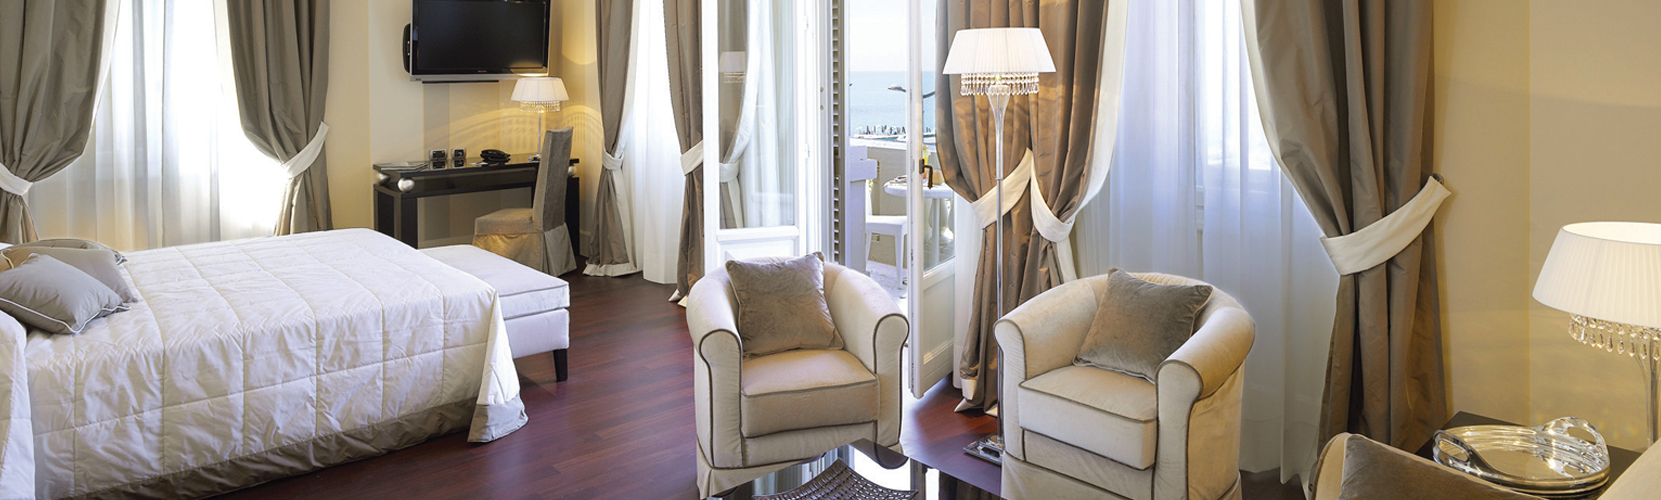 Tuscany wellness spa by uappala hotels for Pacchetti soggiorno regalo